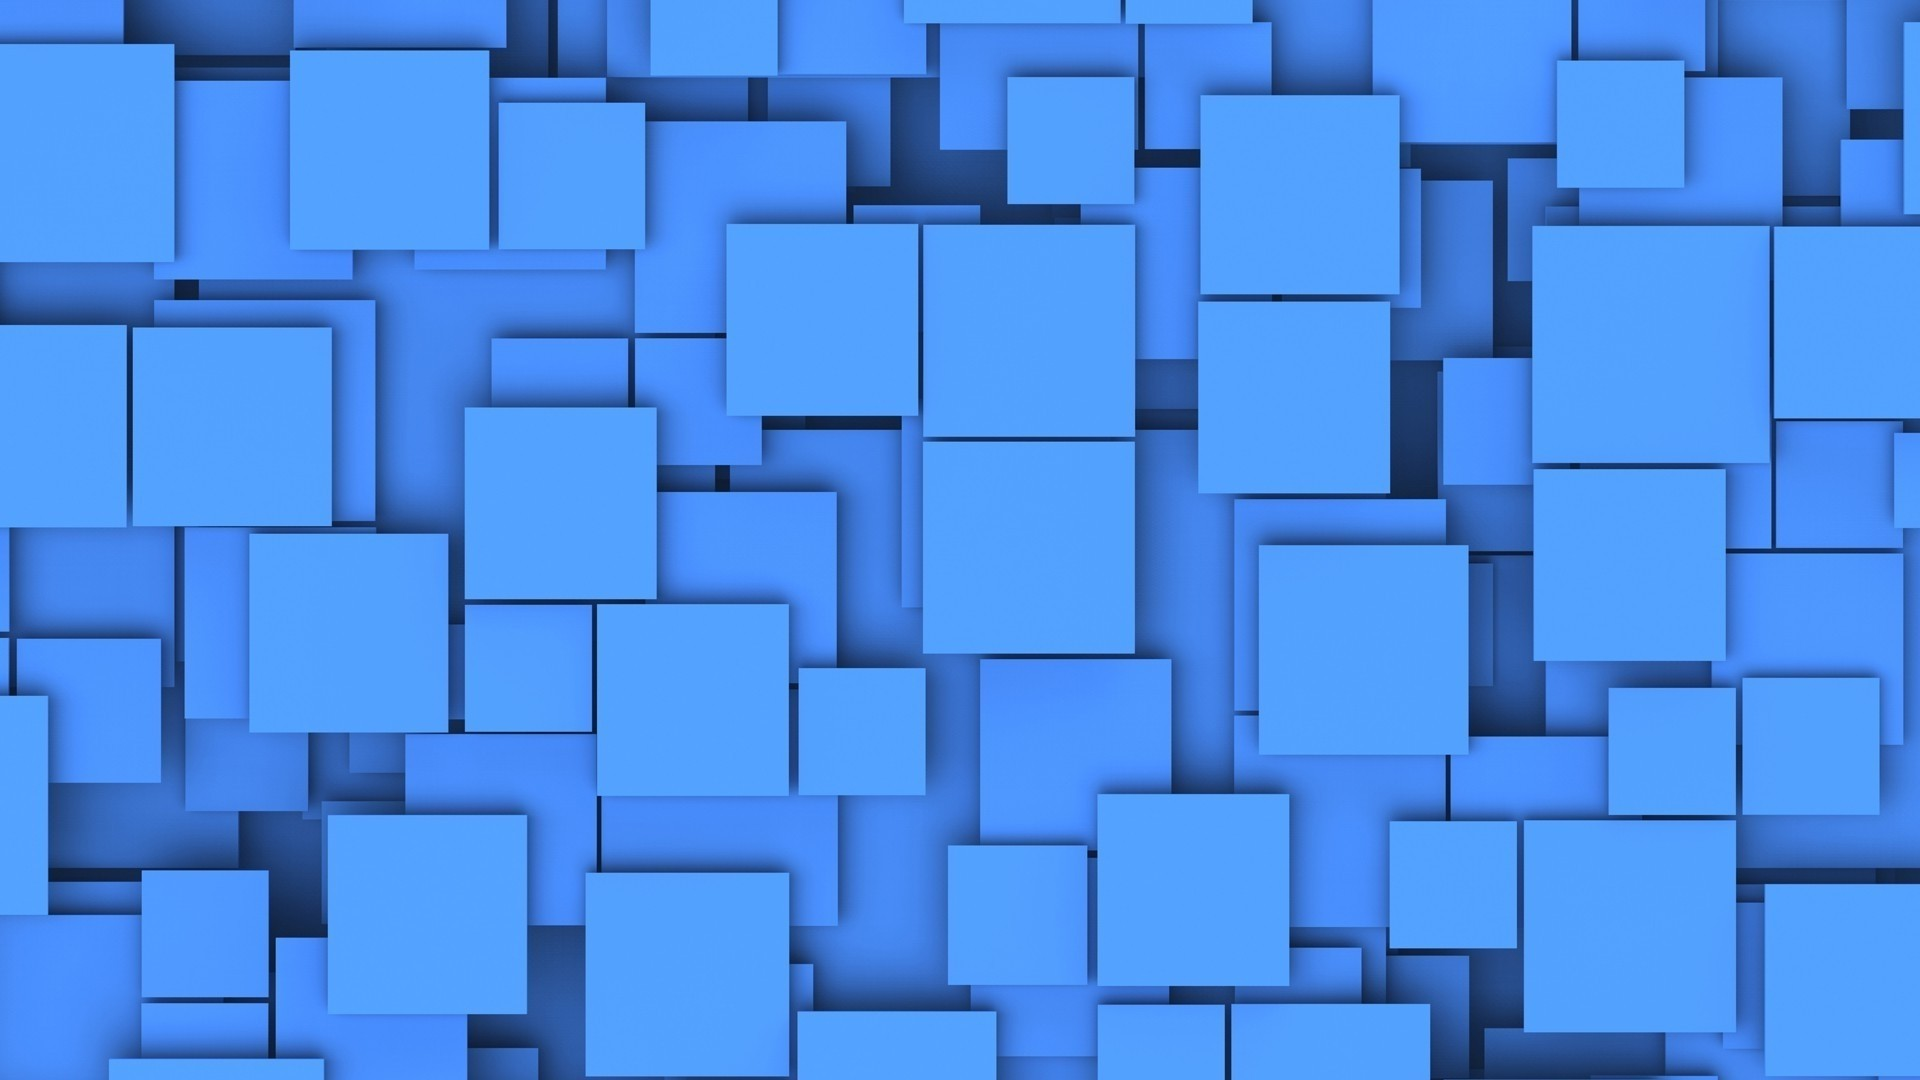 Tile hd wallpaper download